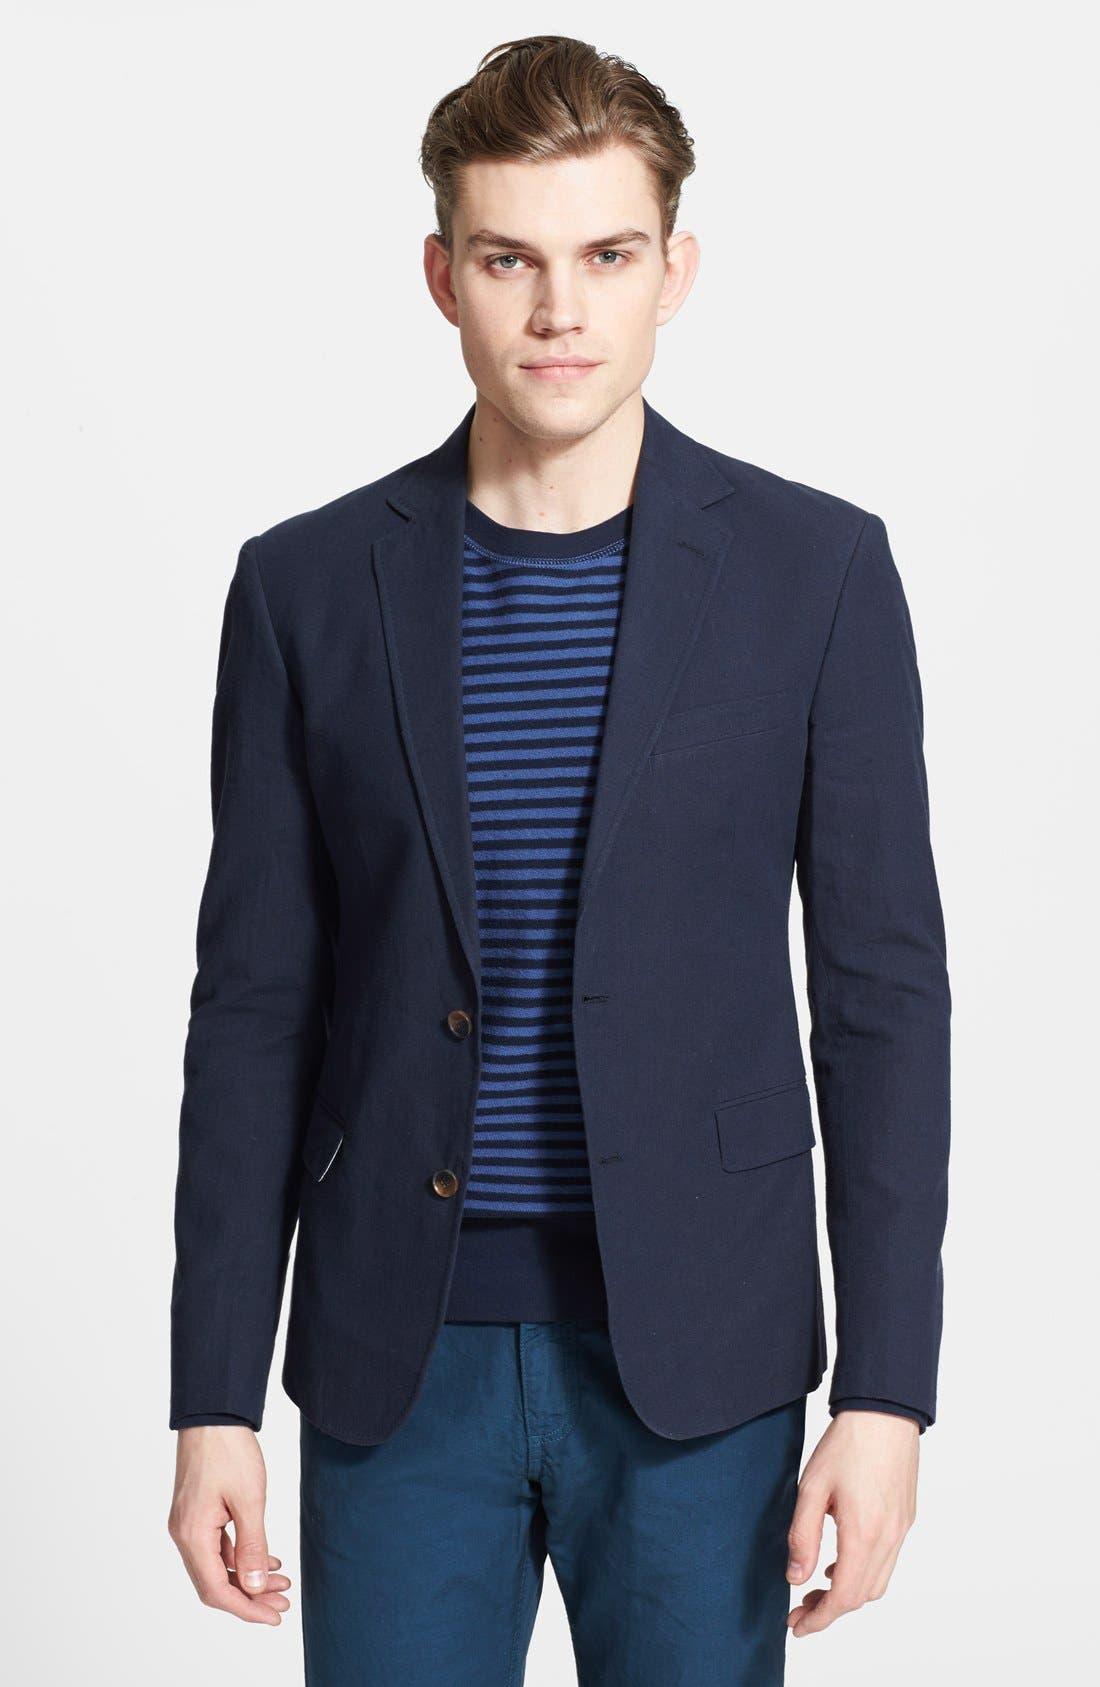 Alternate Image 1 Selected - Billy Reid 'Lexington' Cotton & Linen Sportcoat